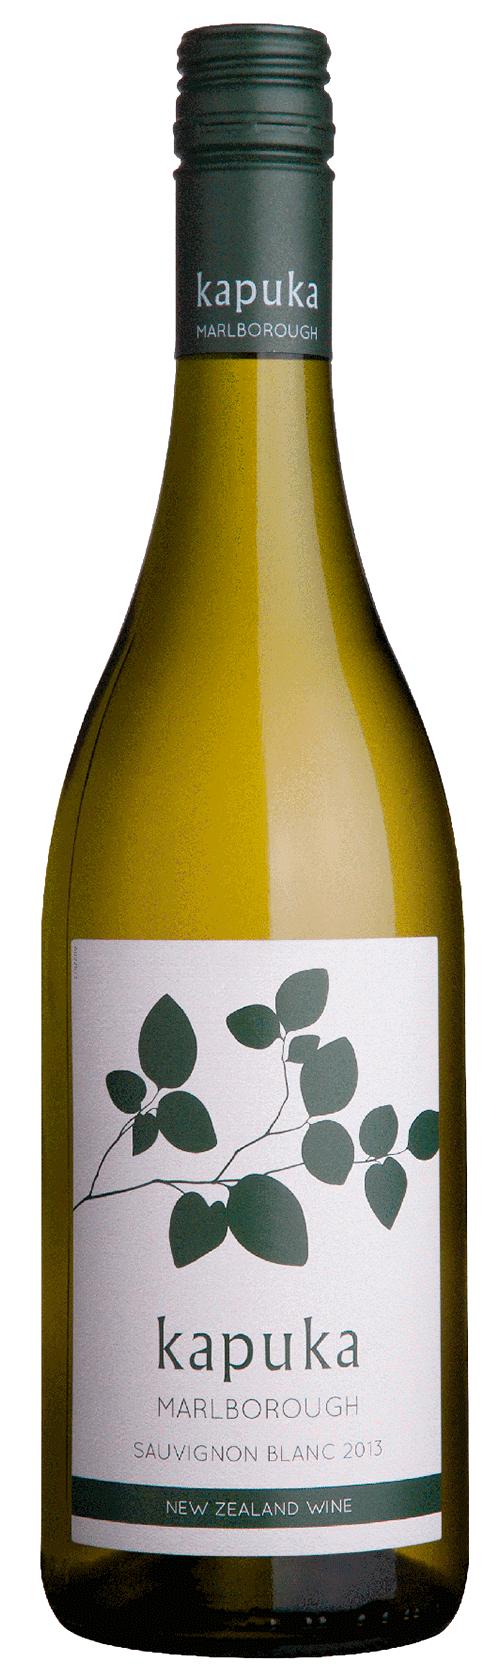 Kapuka Sauvignon Blanc 2013